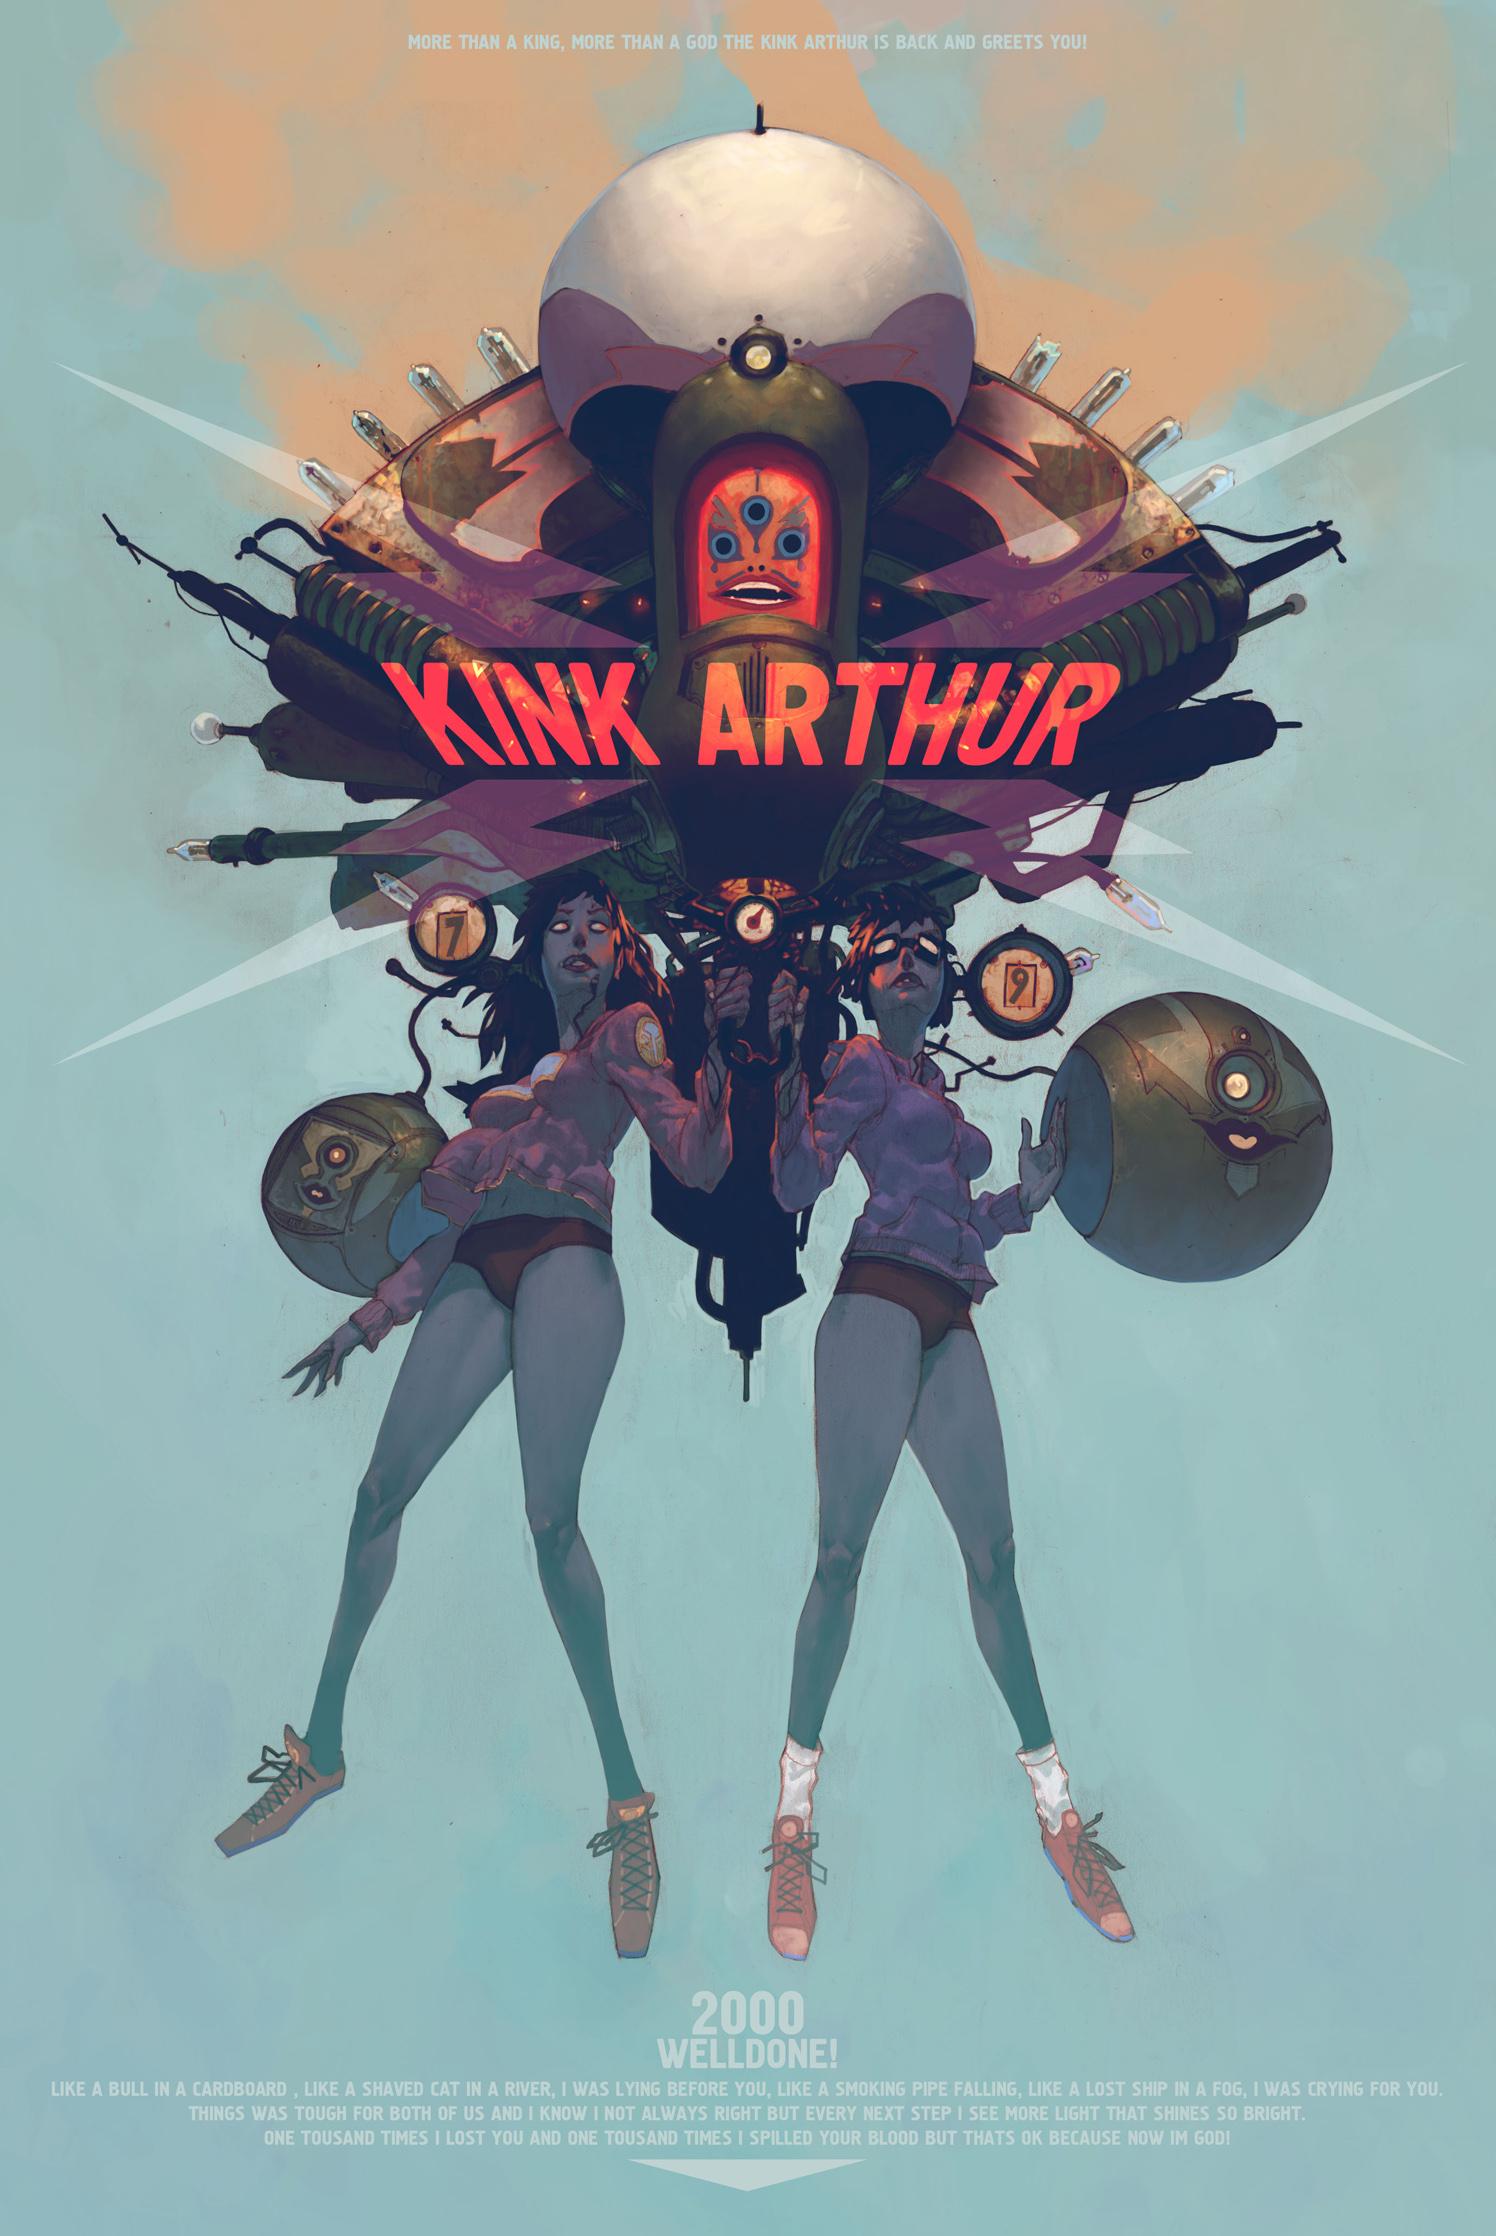 Kink Arthur - Vasili Zorin - Debut Art